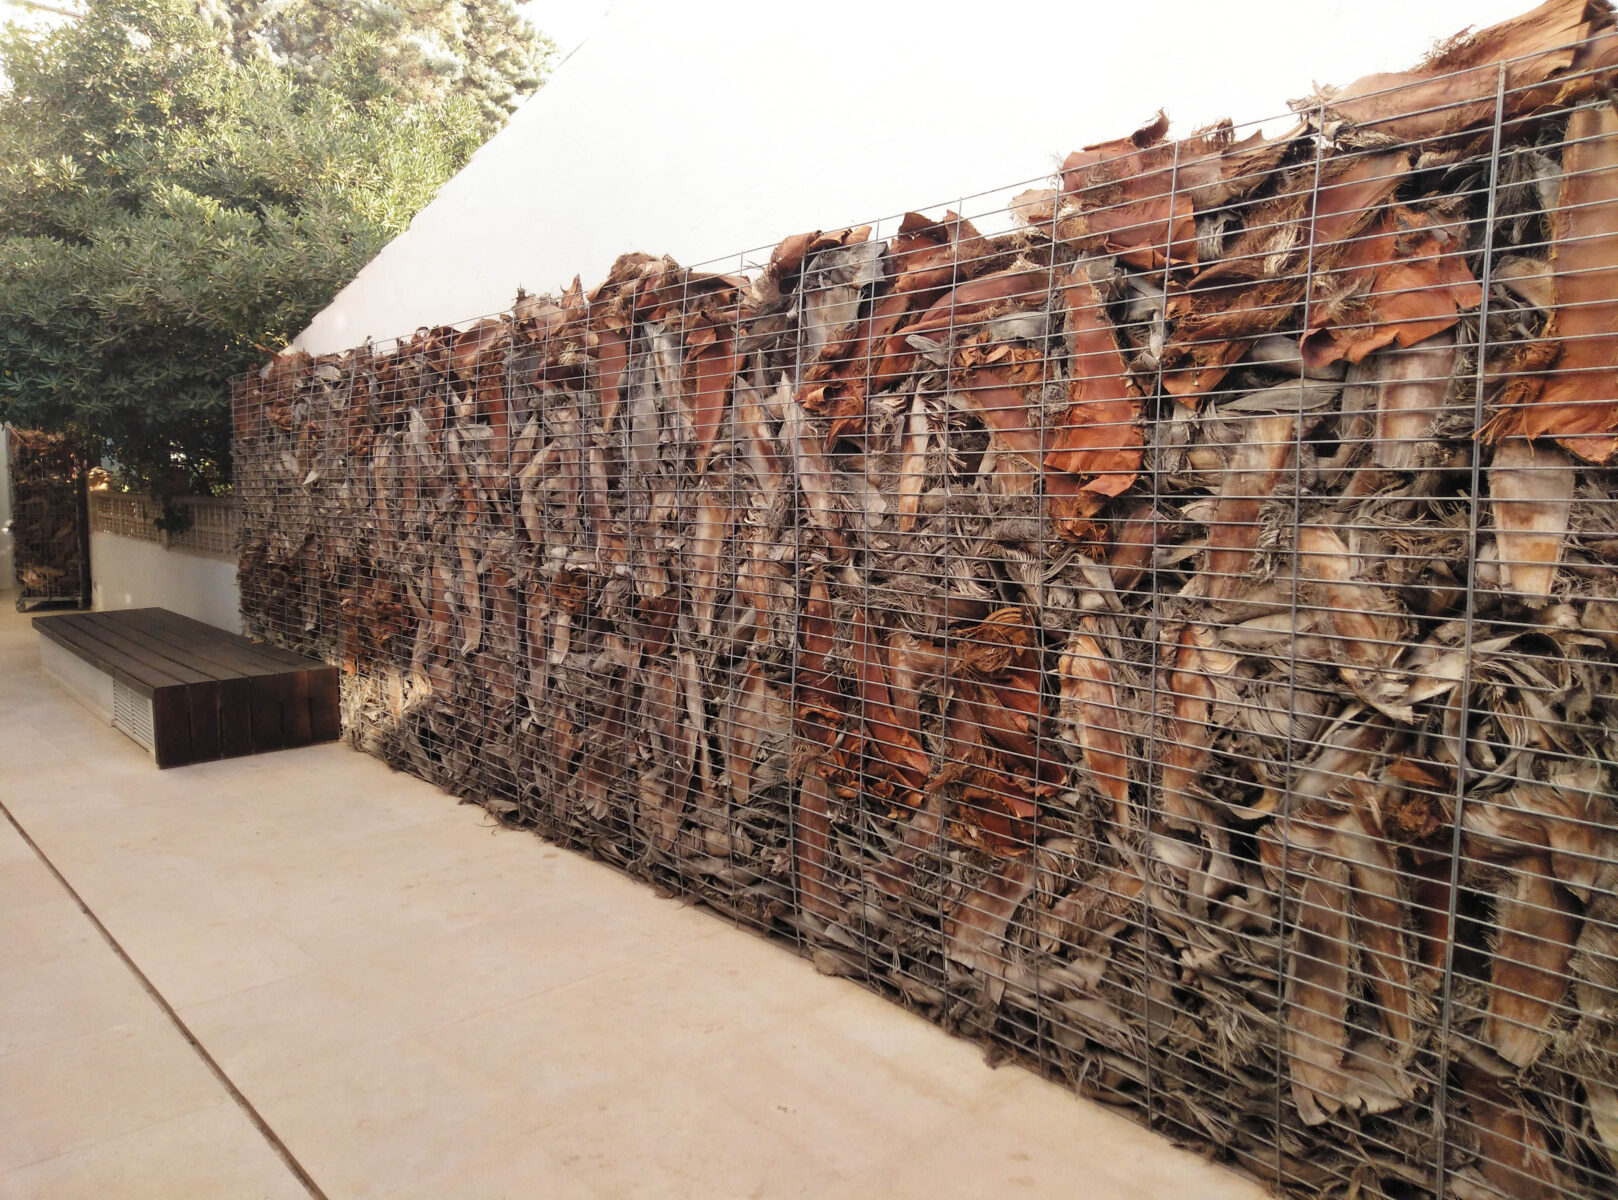 js palmastay wall